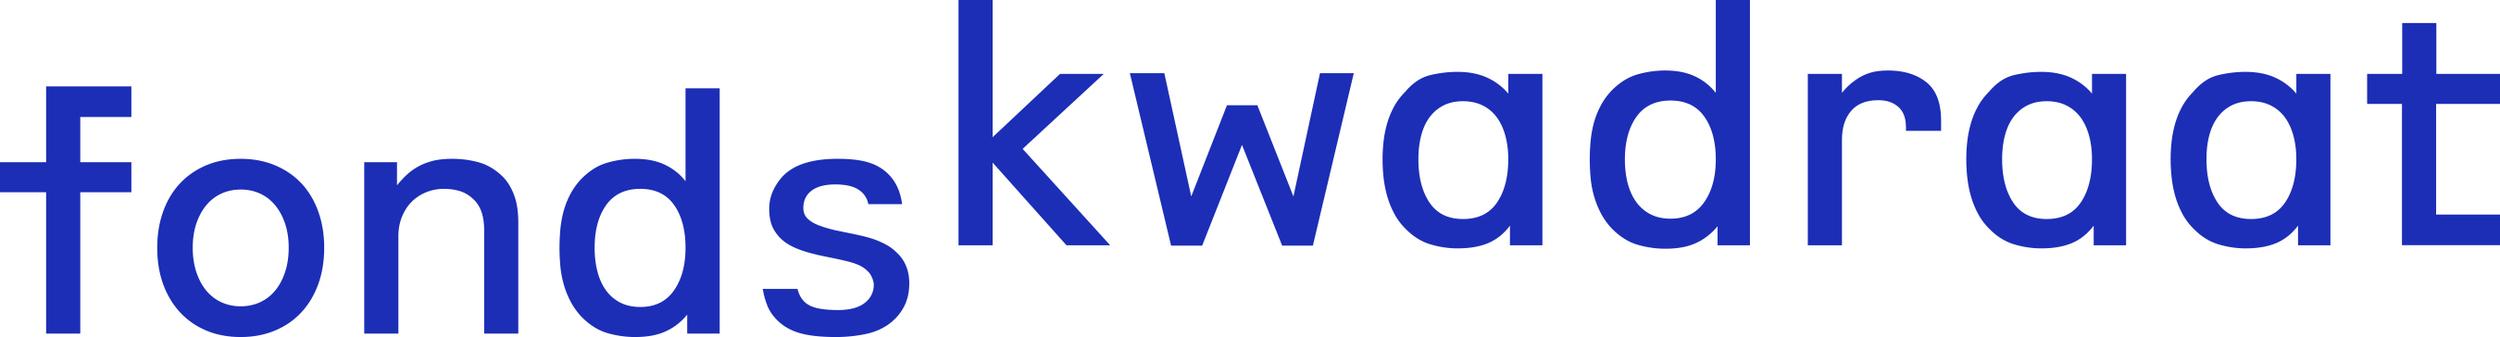 Logo_FondsKwadraat.jpg